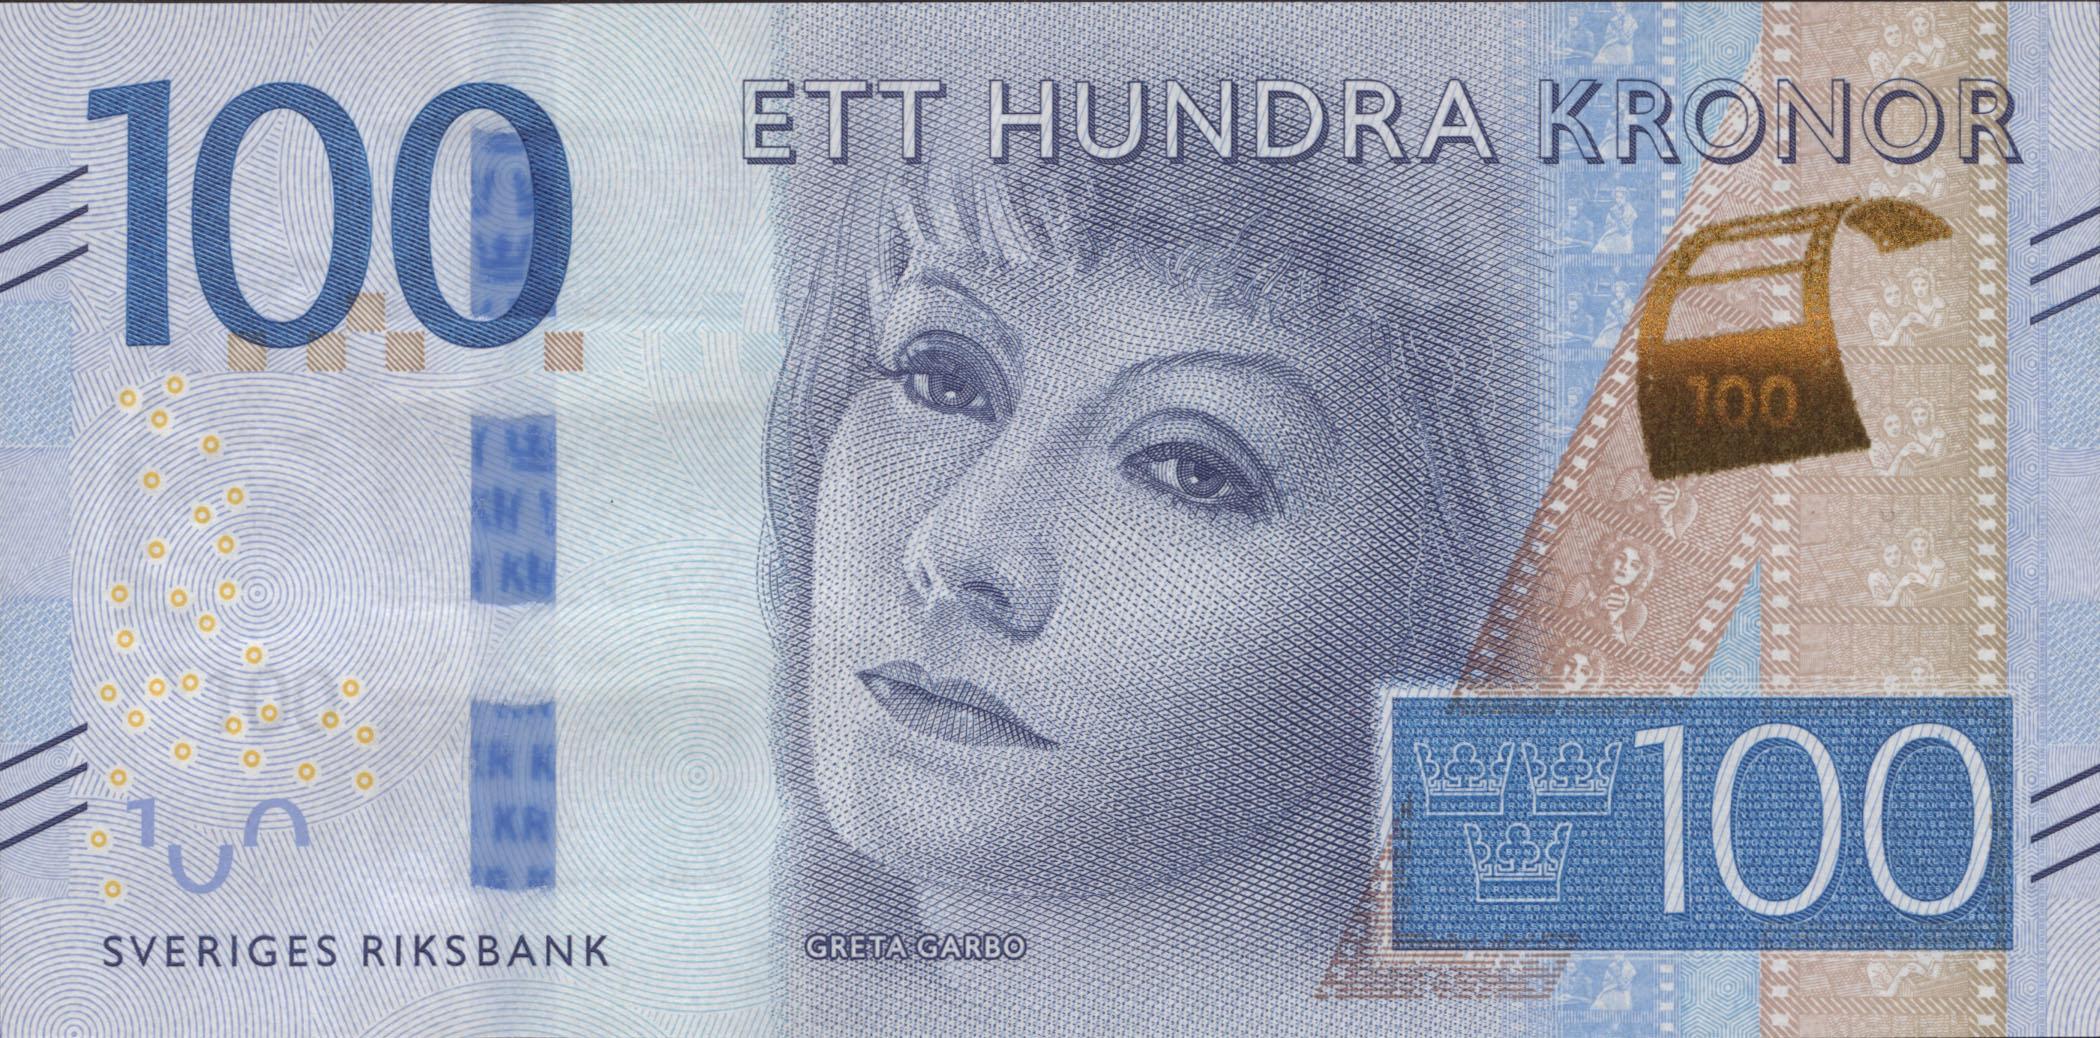 euro island kronen